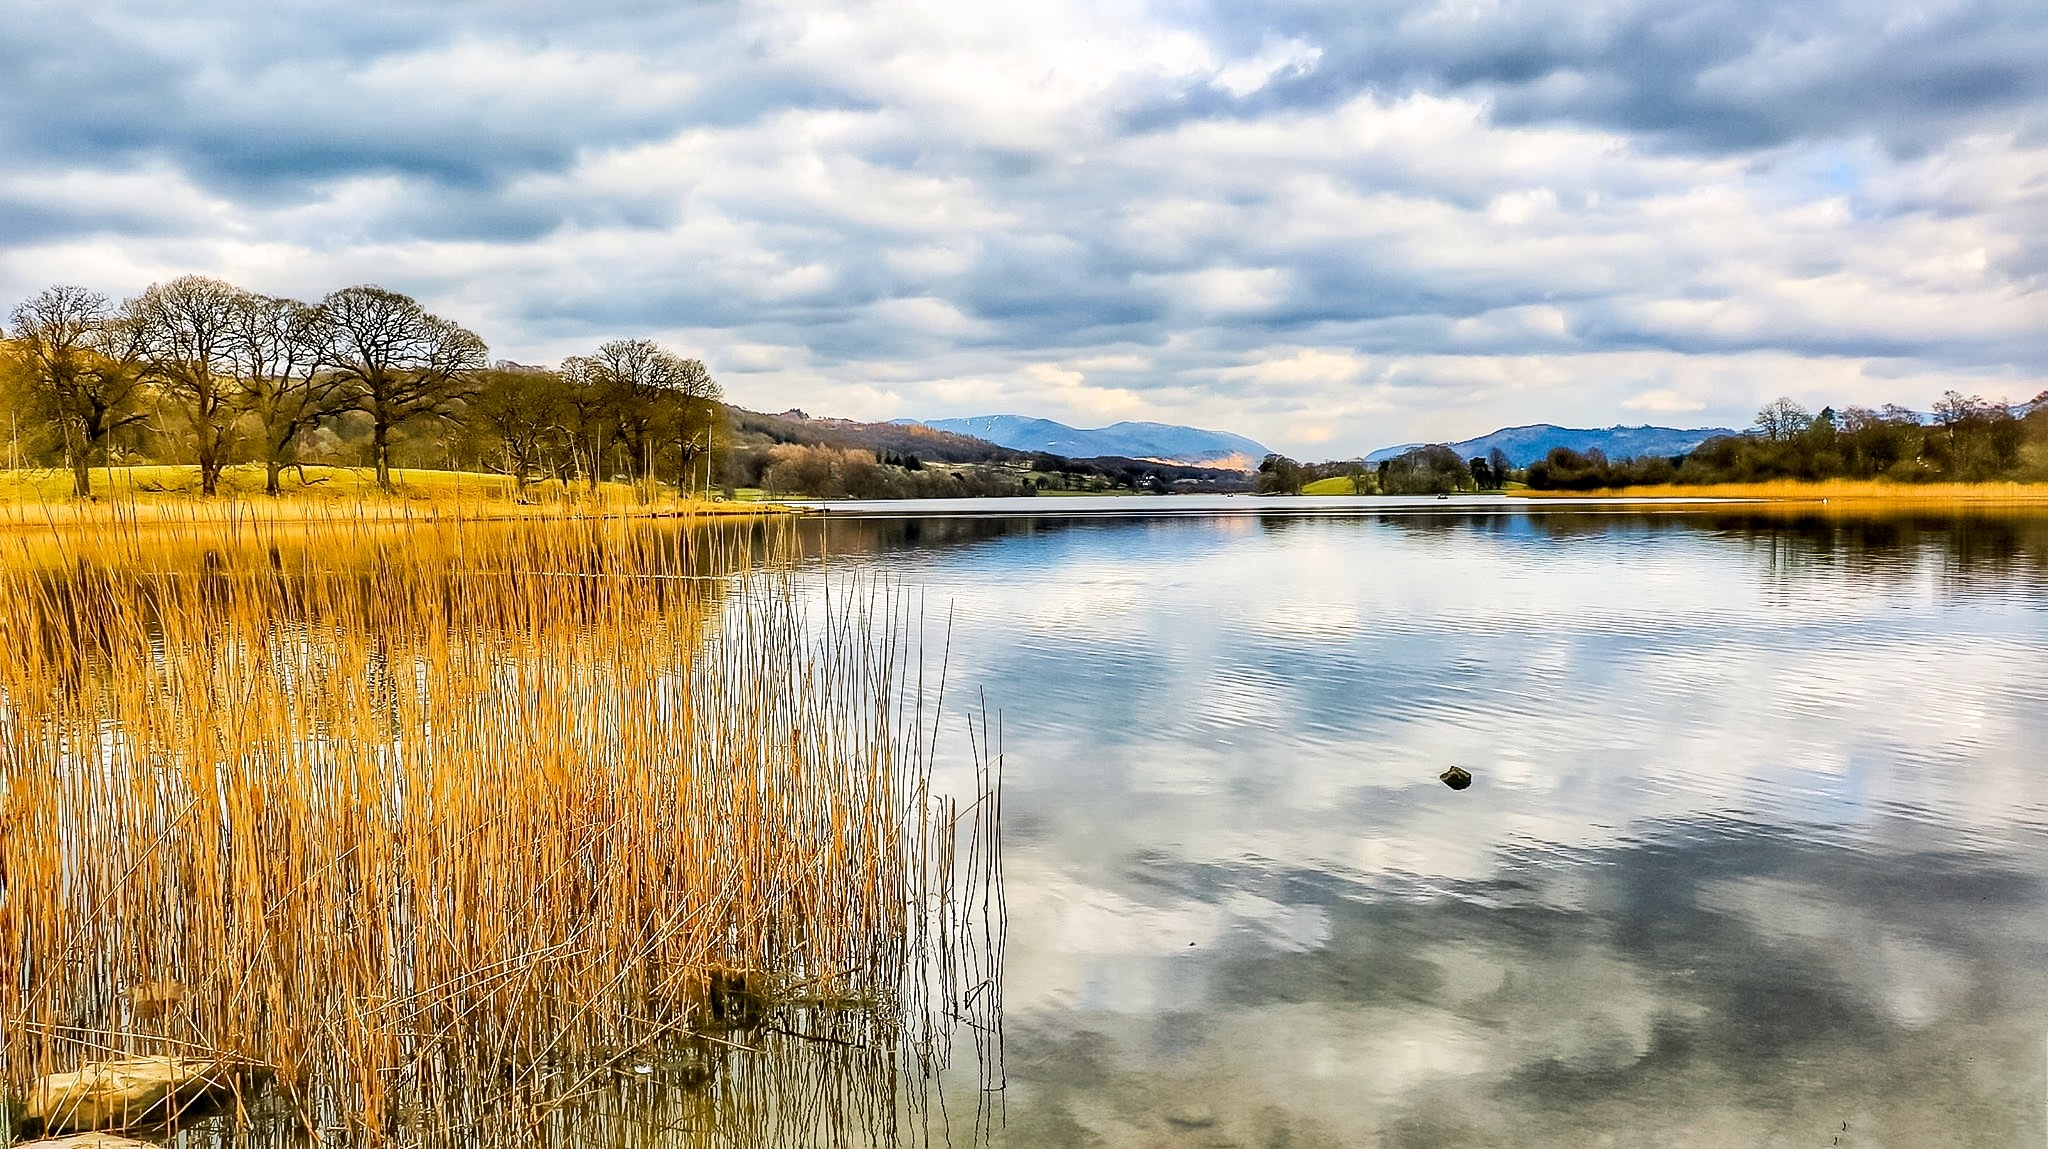 Lake Cloud Reflectionsons...16061446 by Michael jjg